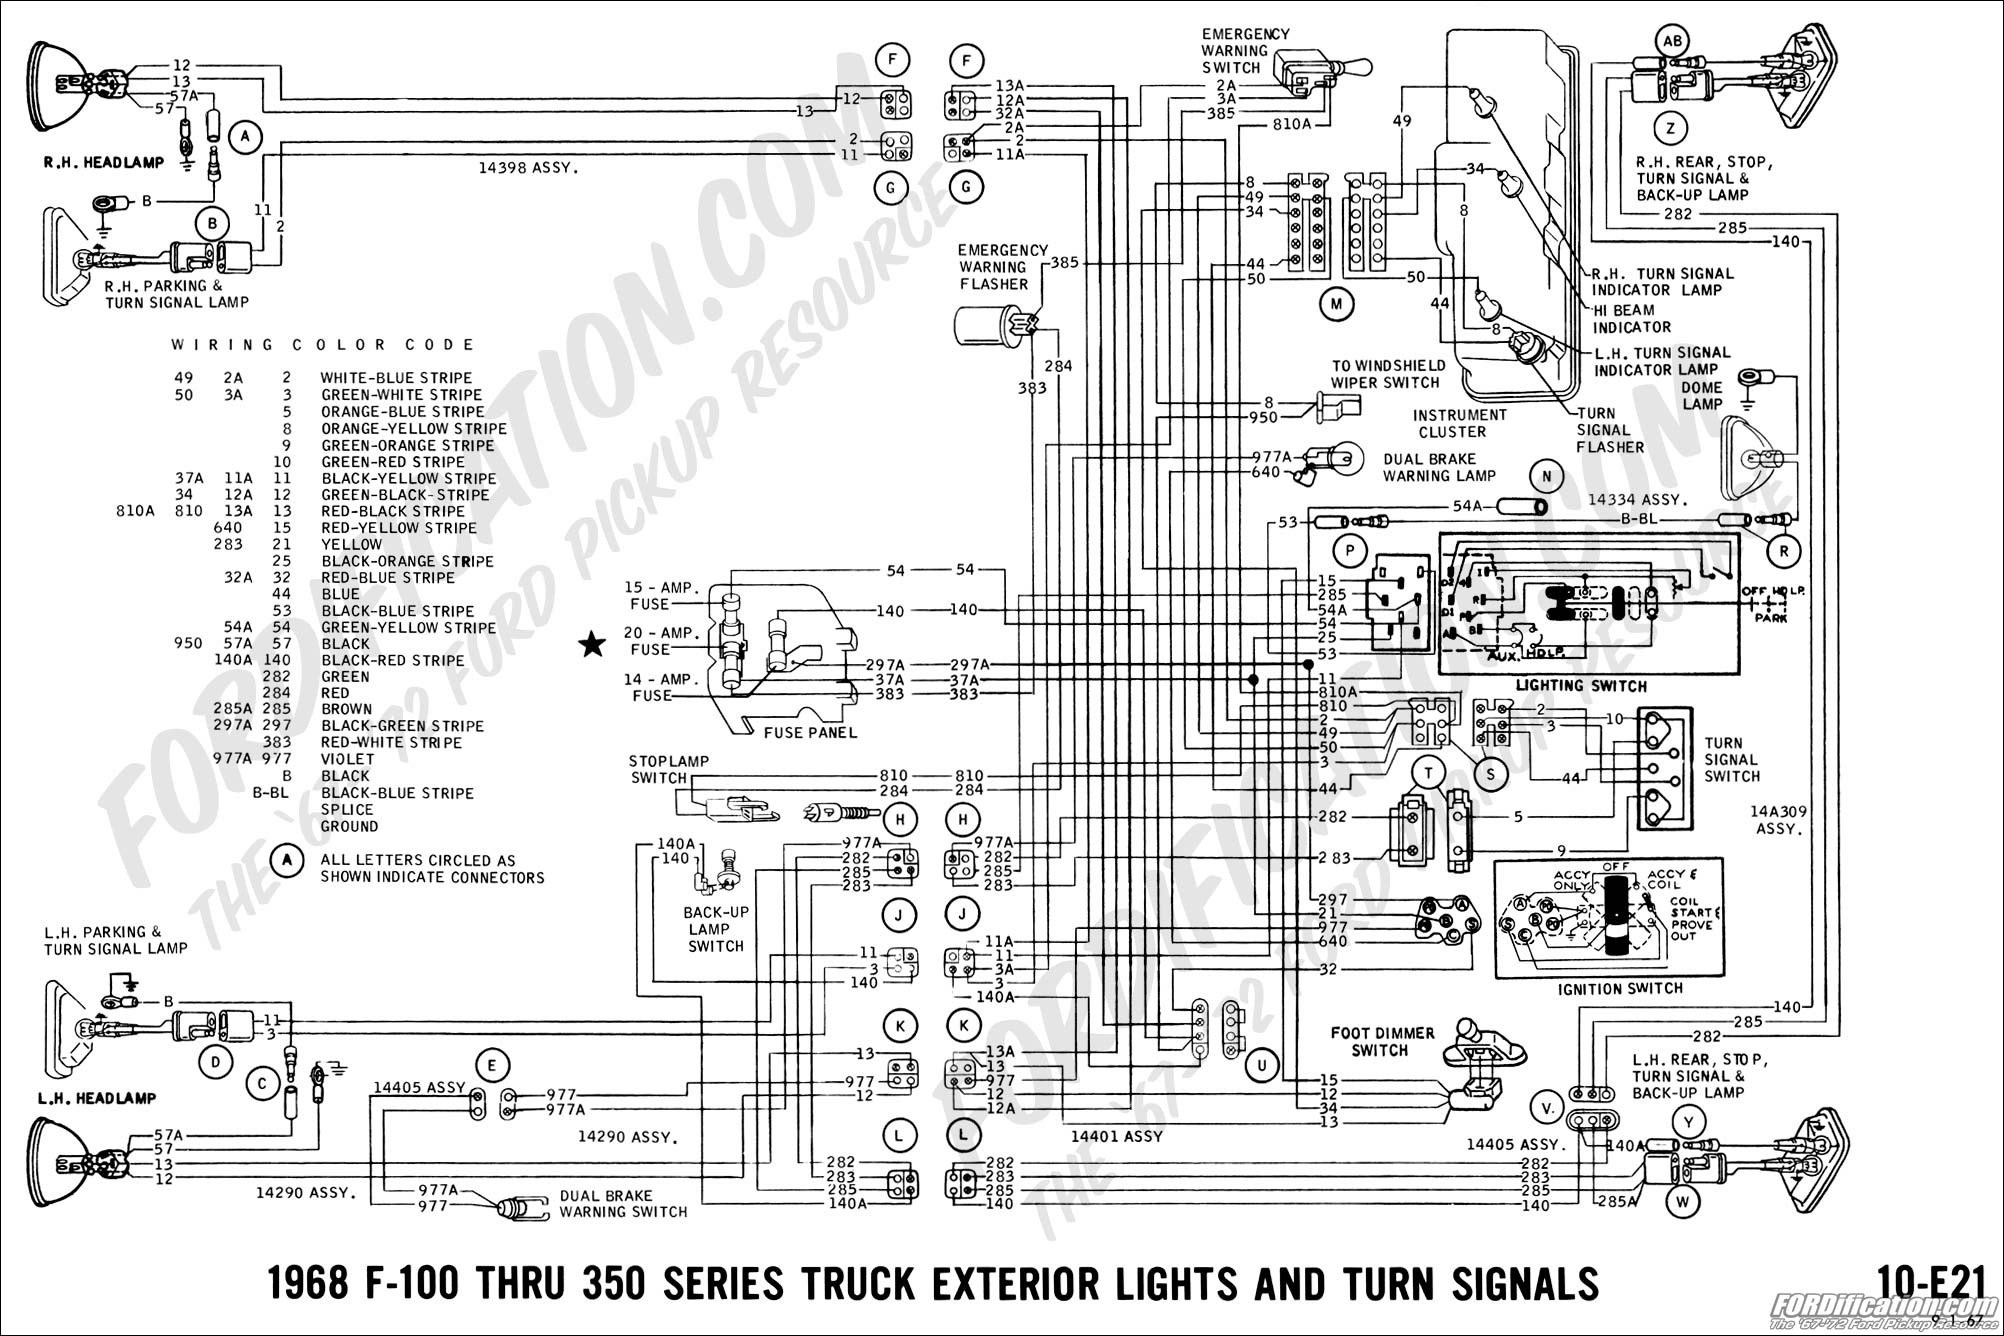 Tf 0836 Caravan Wiring Diagram Wiring Diagrams Jamie39s Touring Solutions Free Diagram